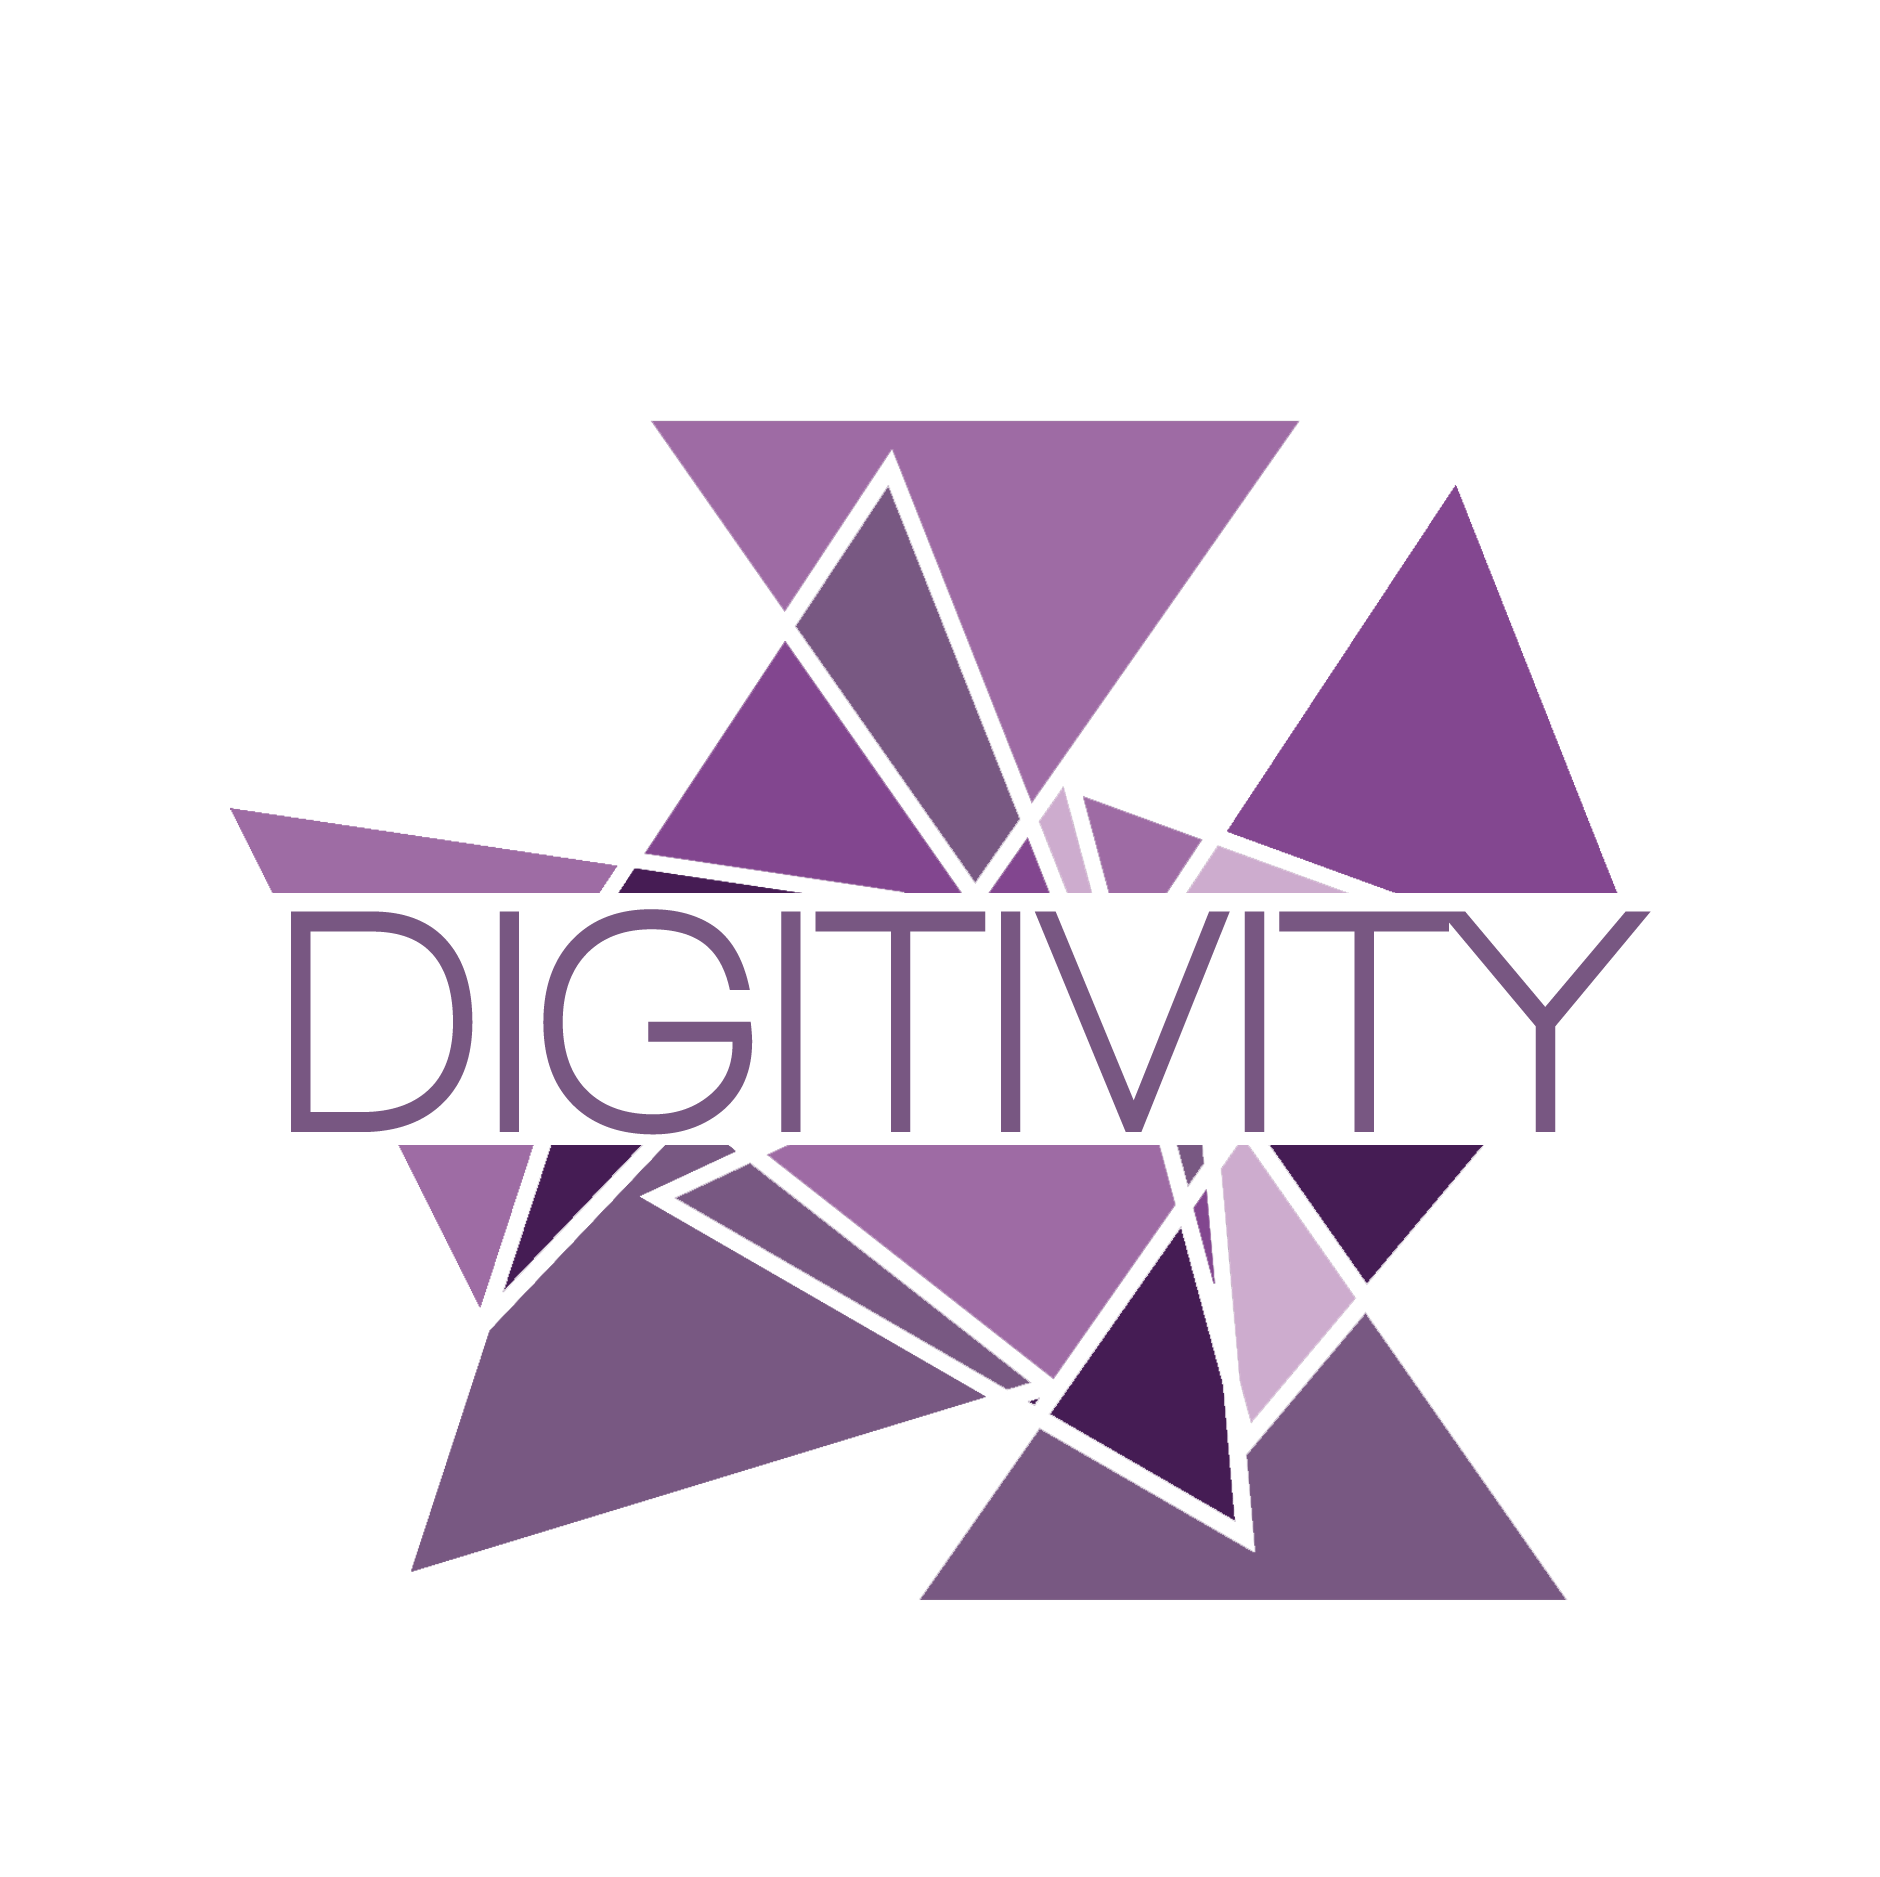 digitivity